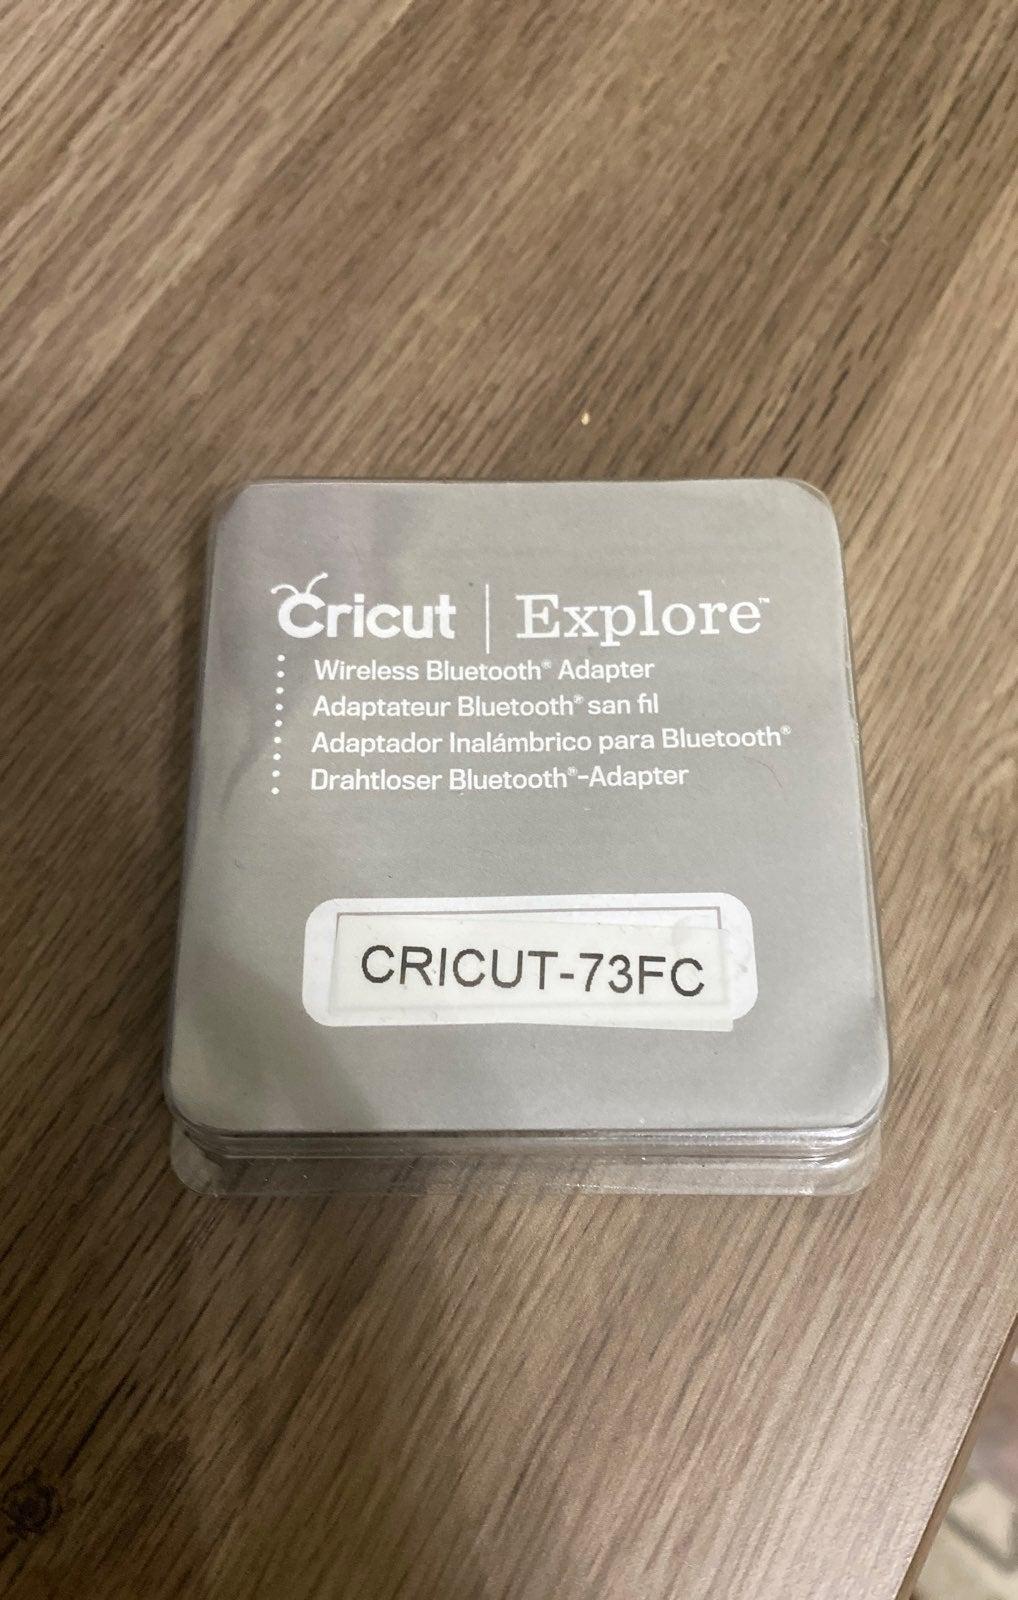 Cricut Wireless Bluetooth Adapter